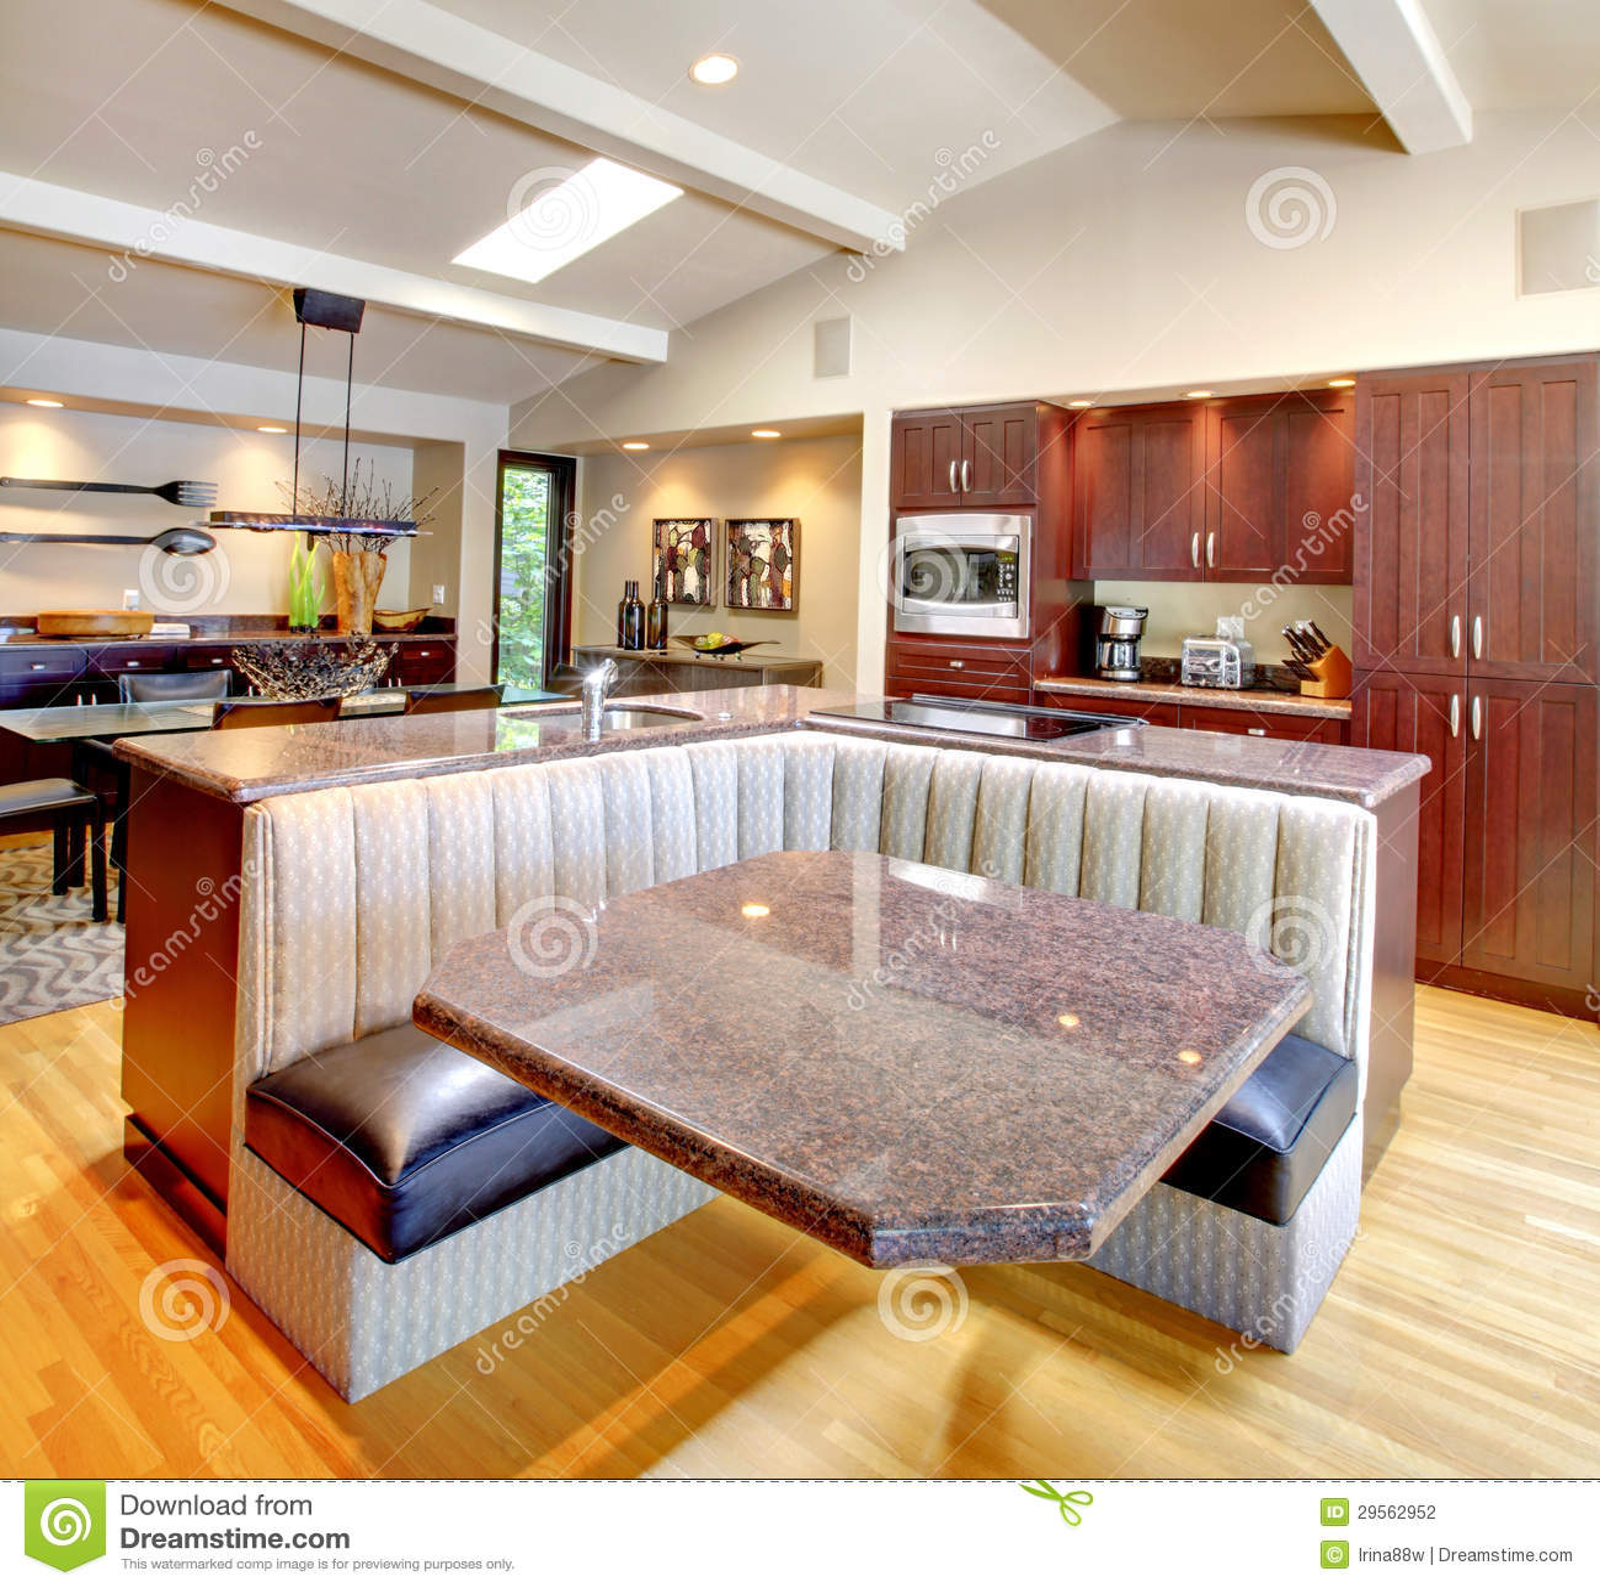 Luxury Mahogany Kitchen With Modern Furniture. Stock ...